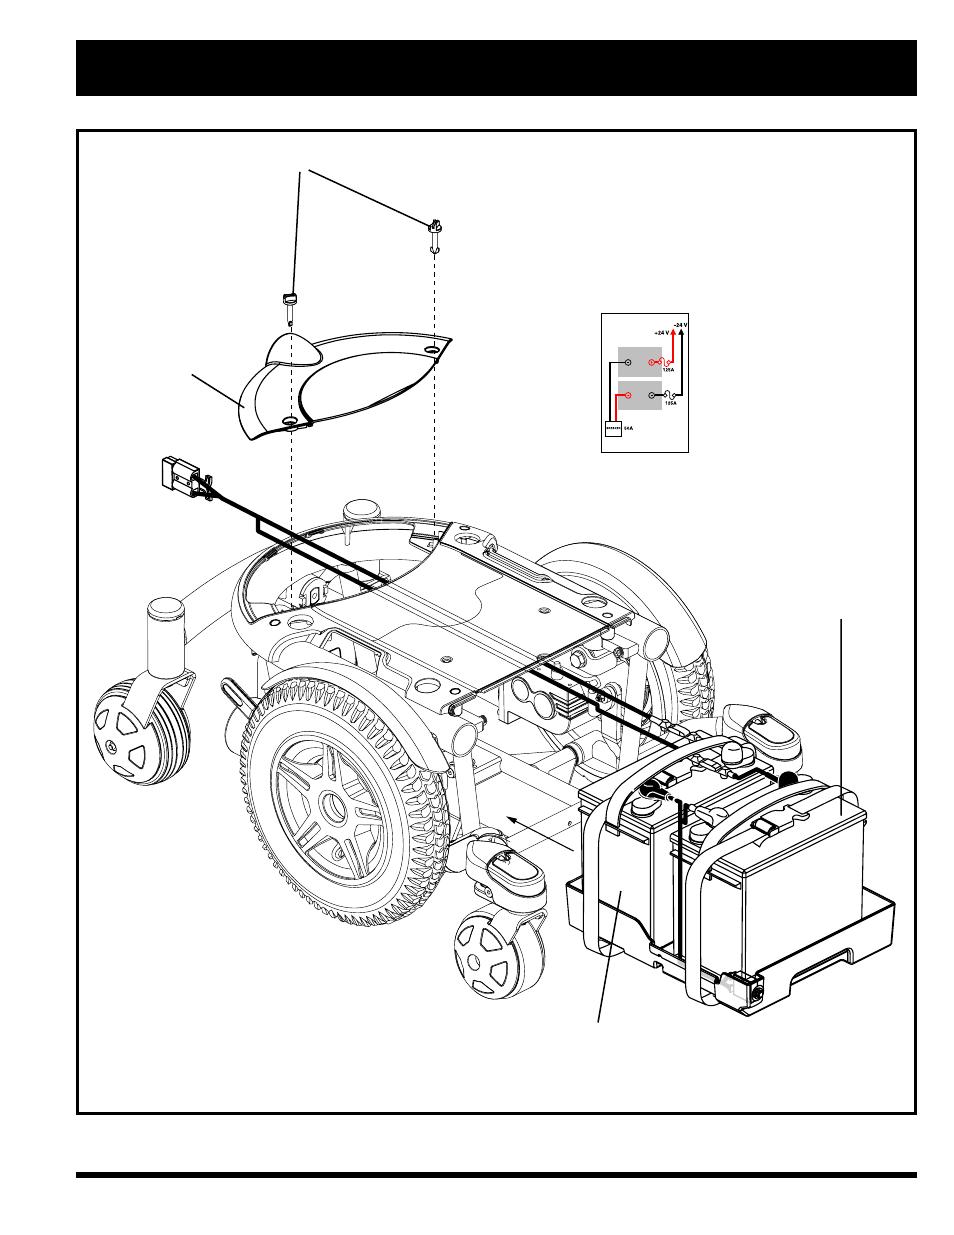 jazzy pride wiring diagram